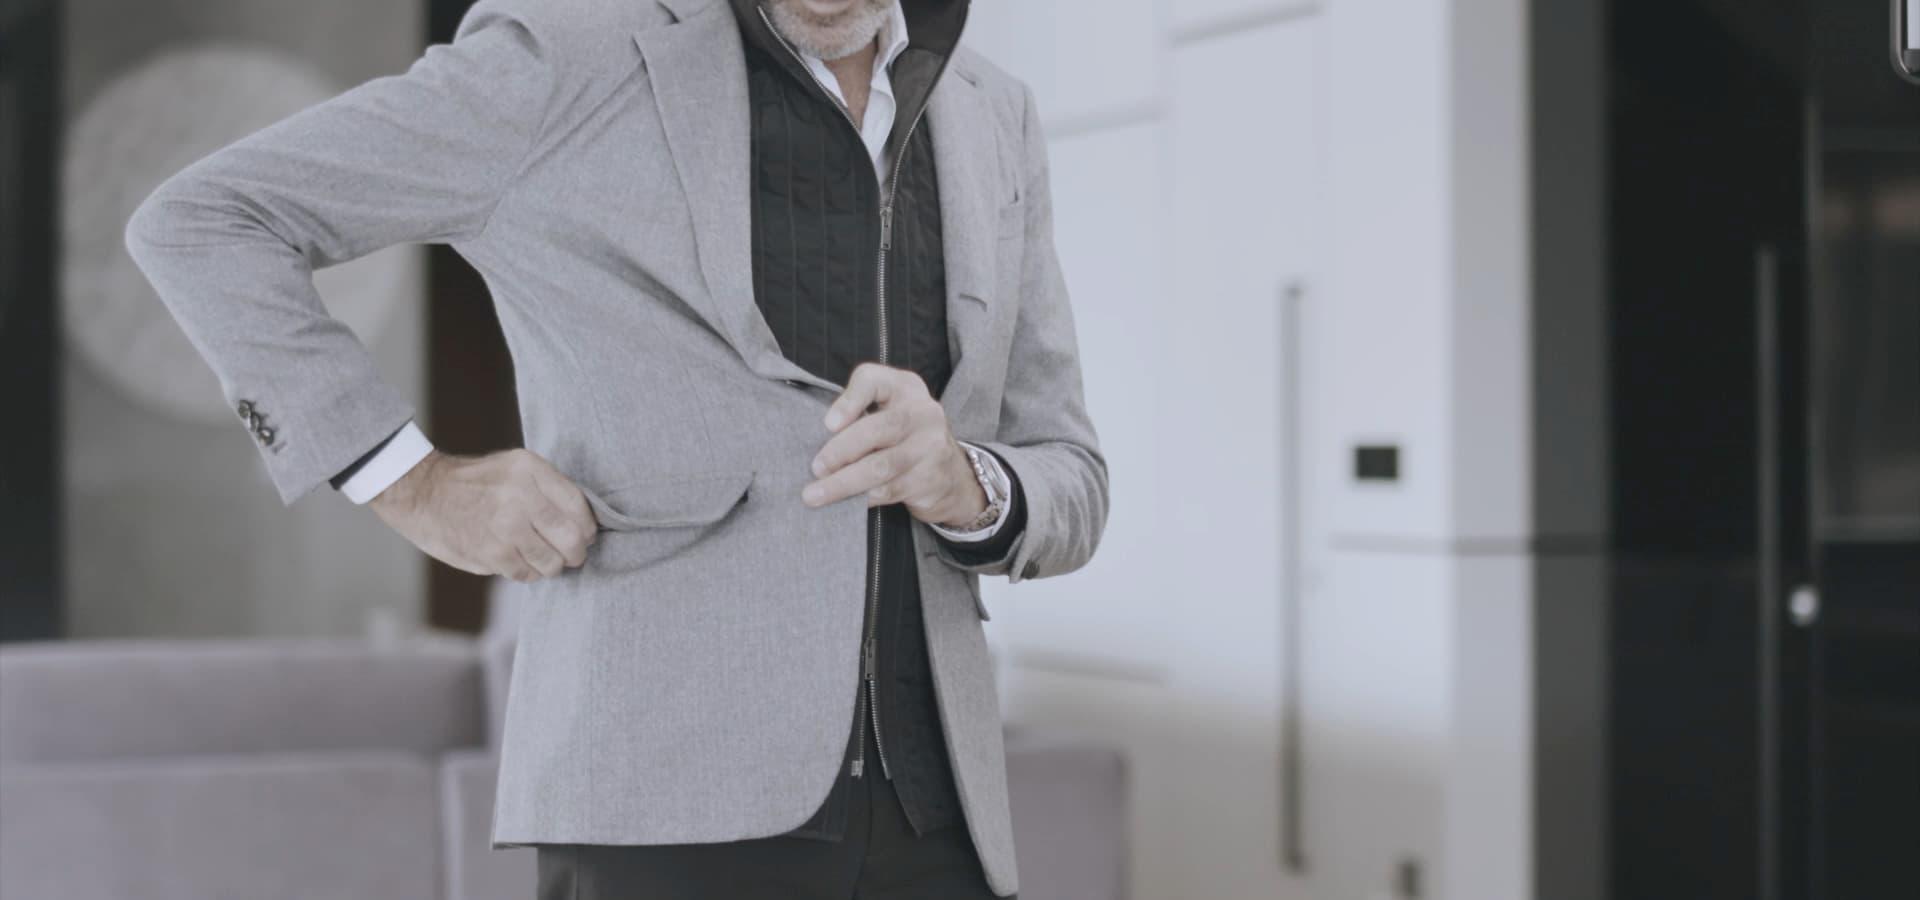 security-pocket